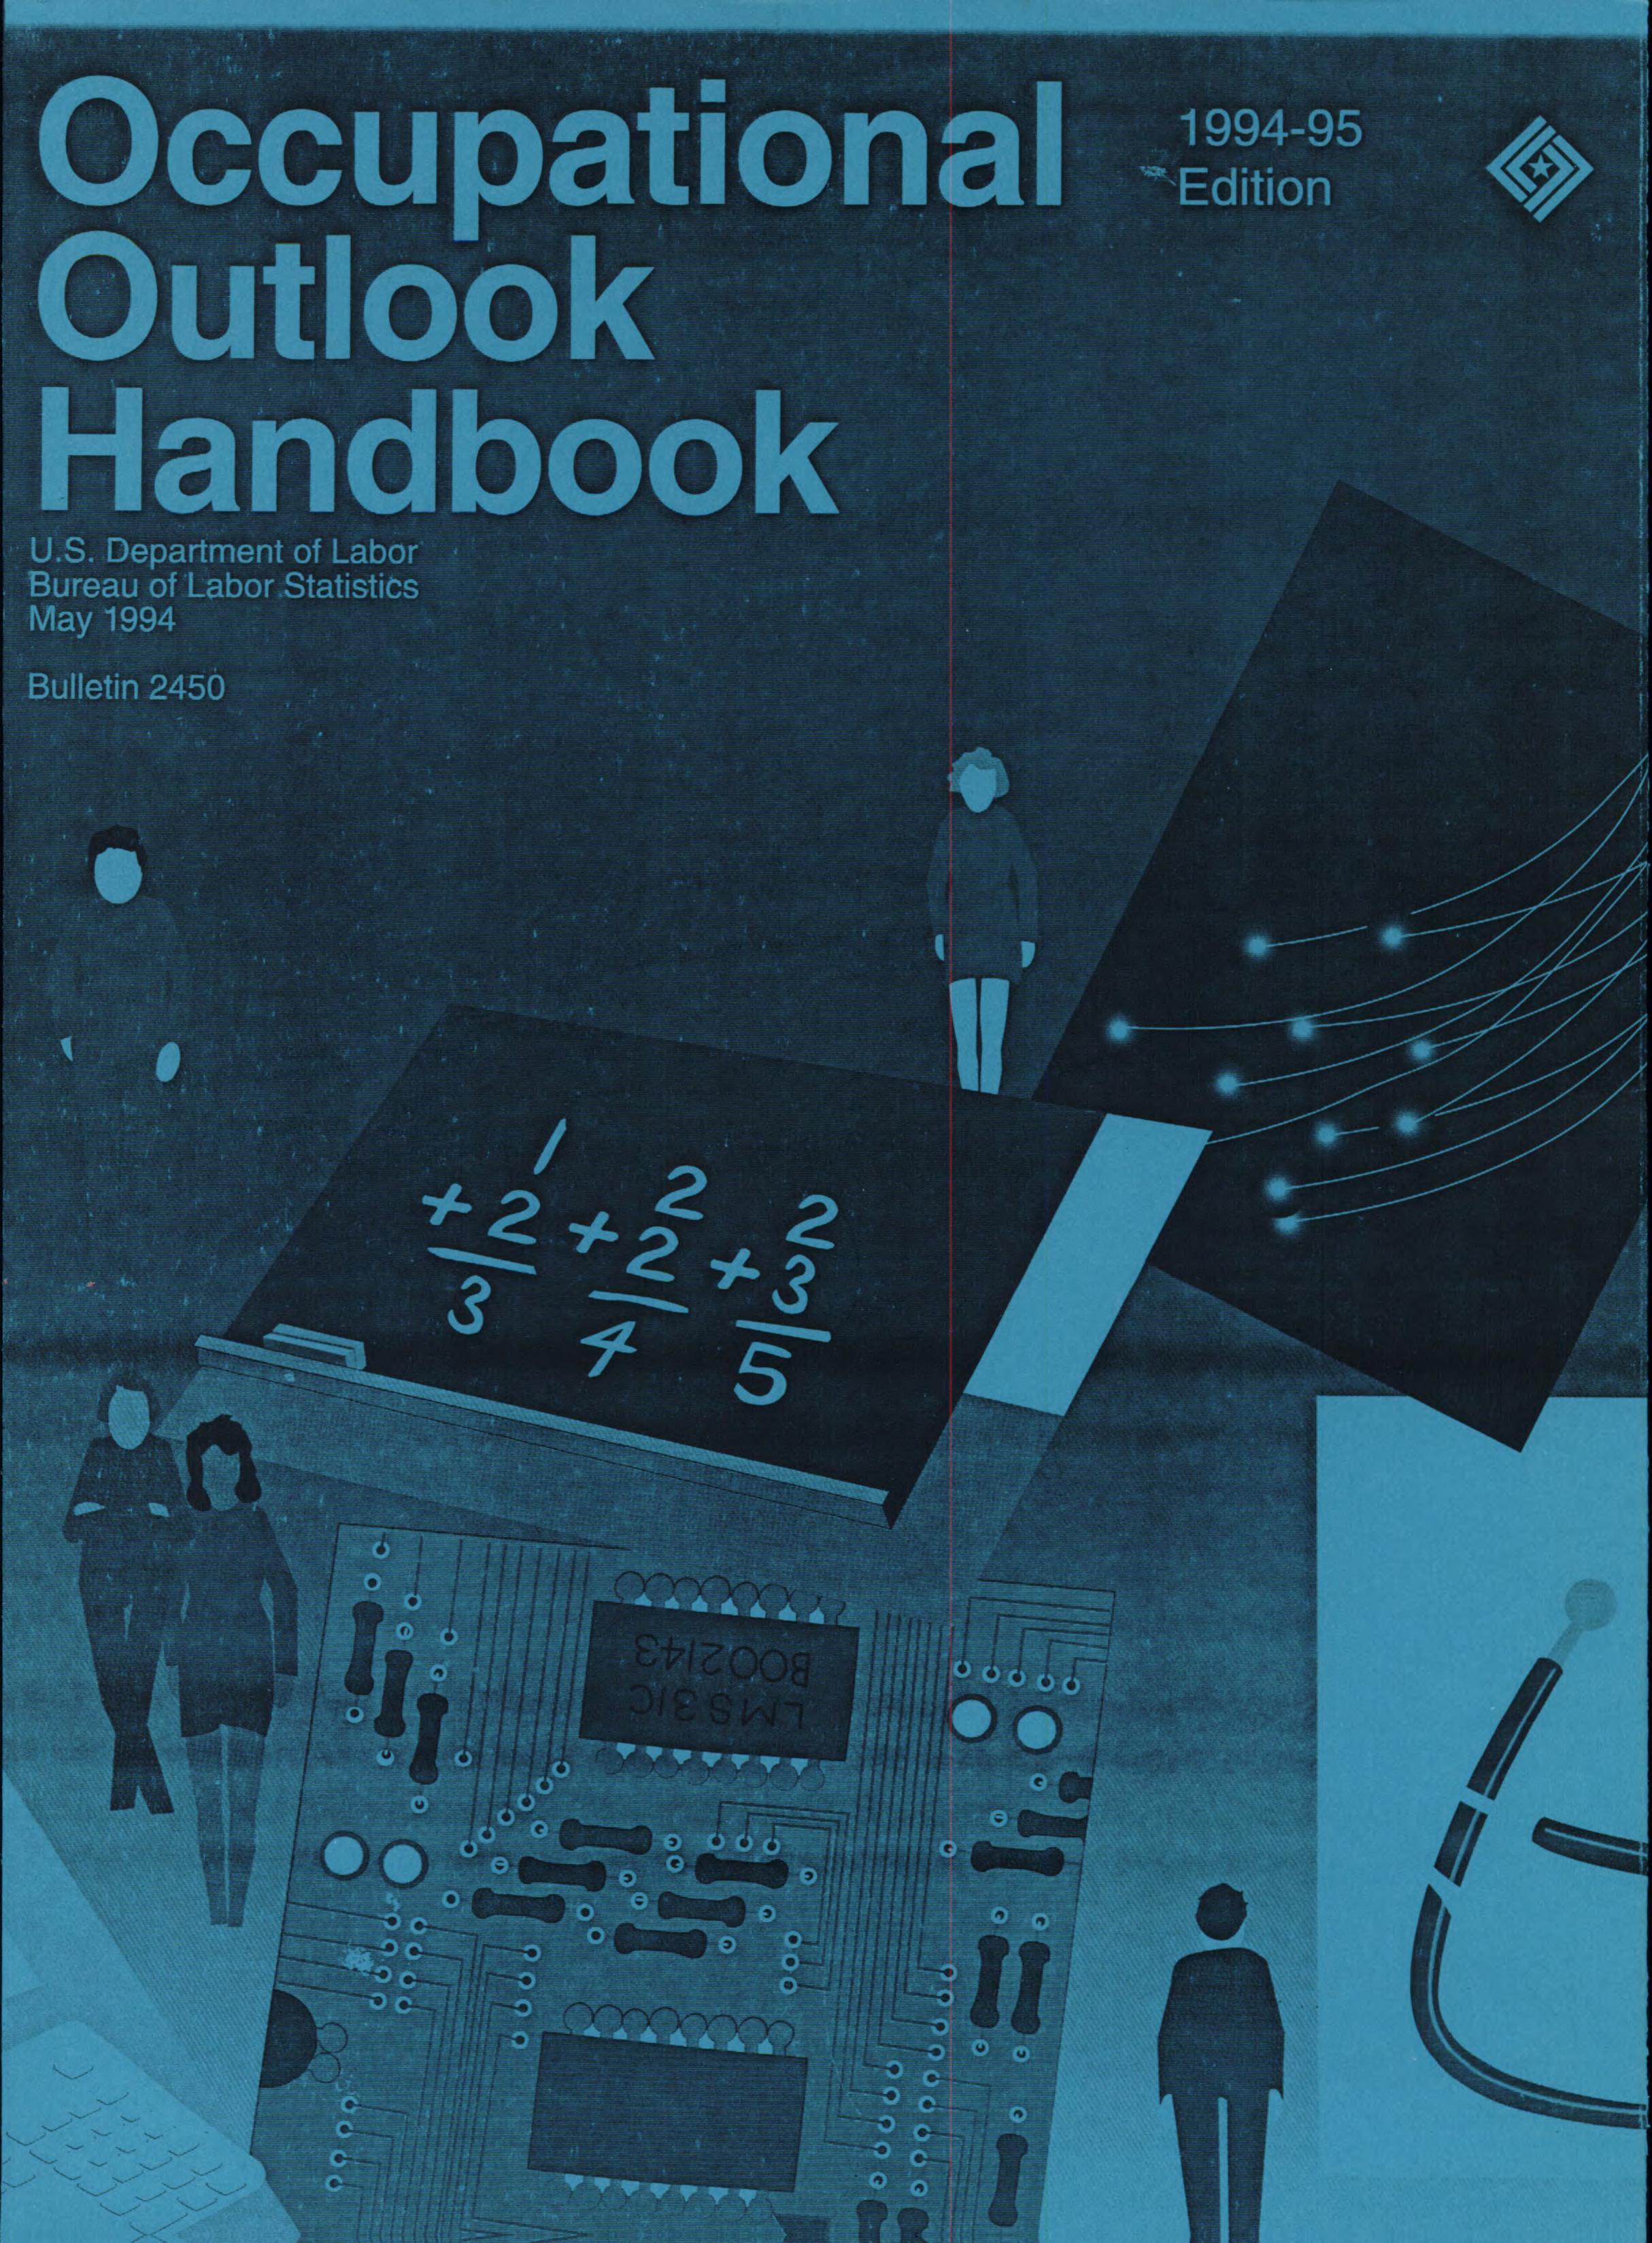 Occupational Outlook Handbook, 1994-1995